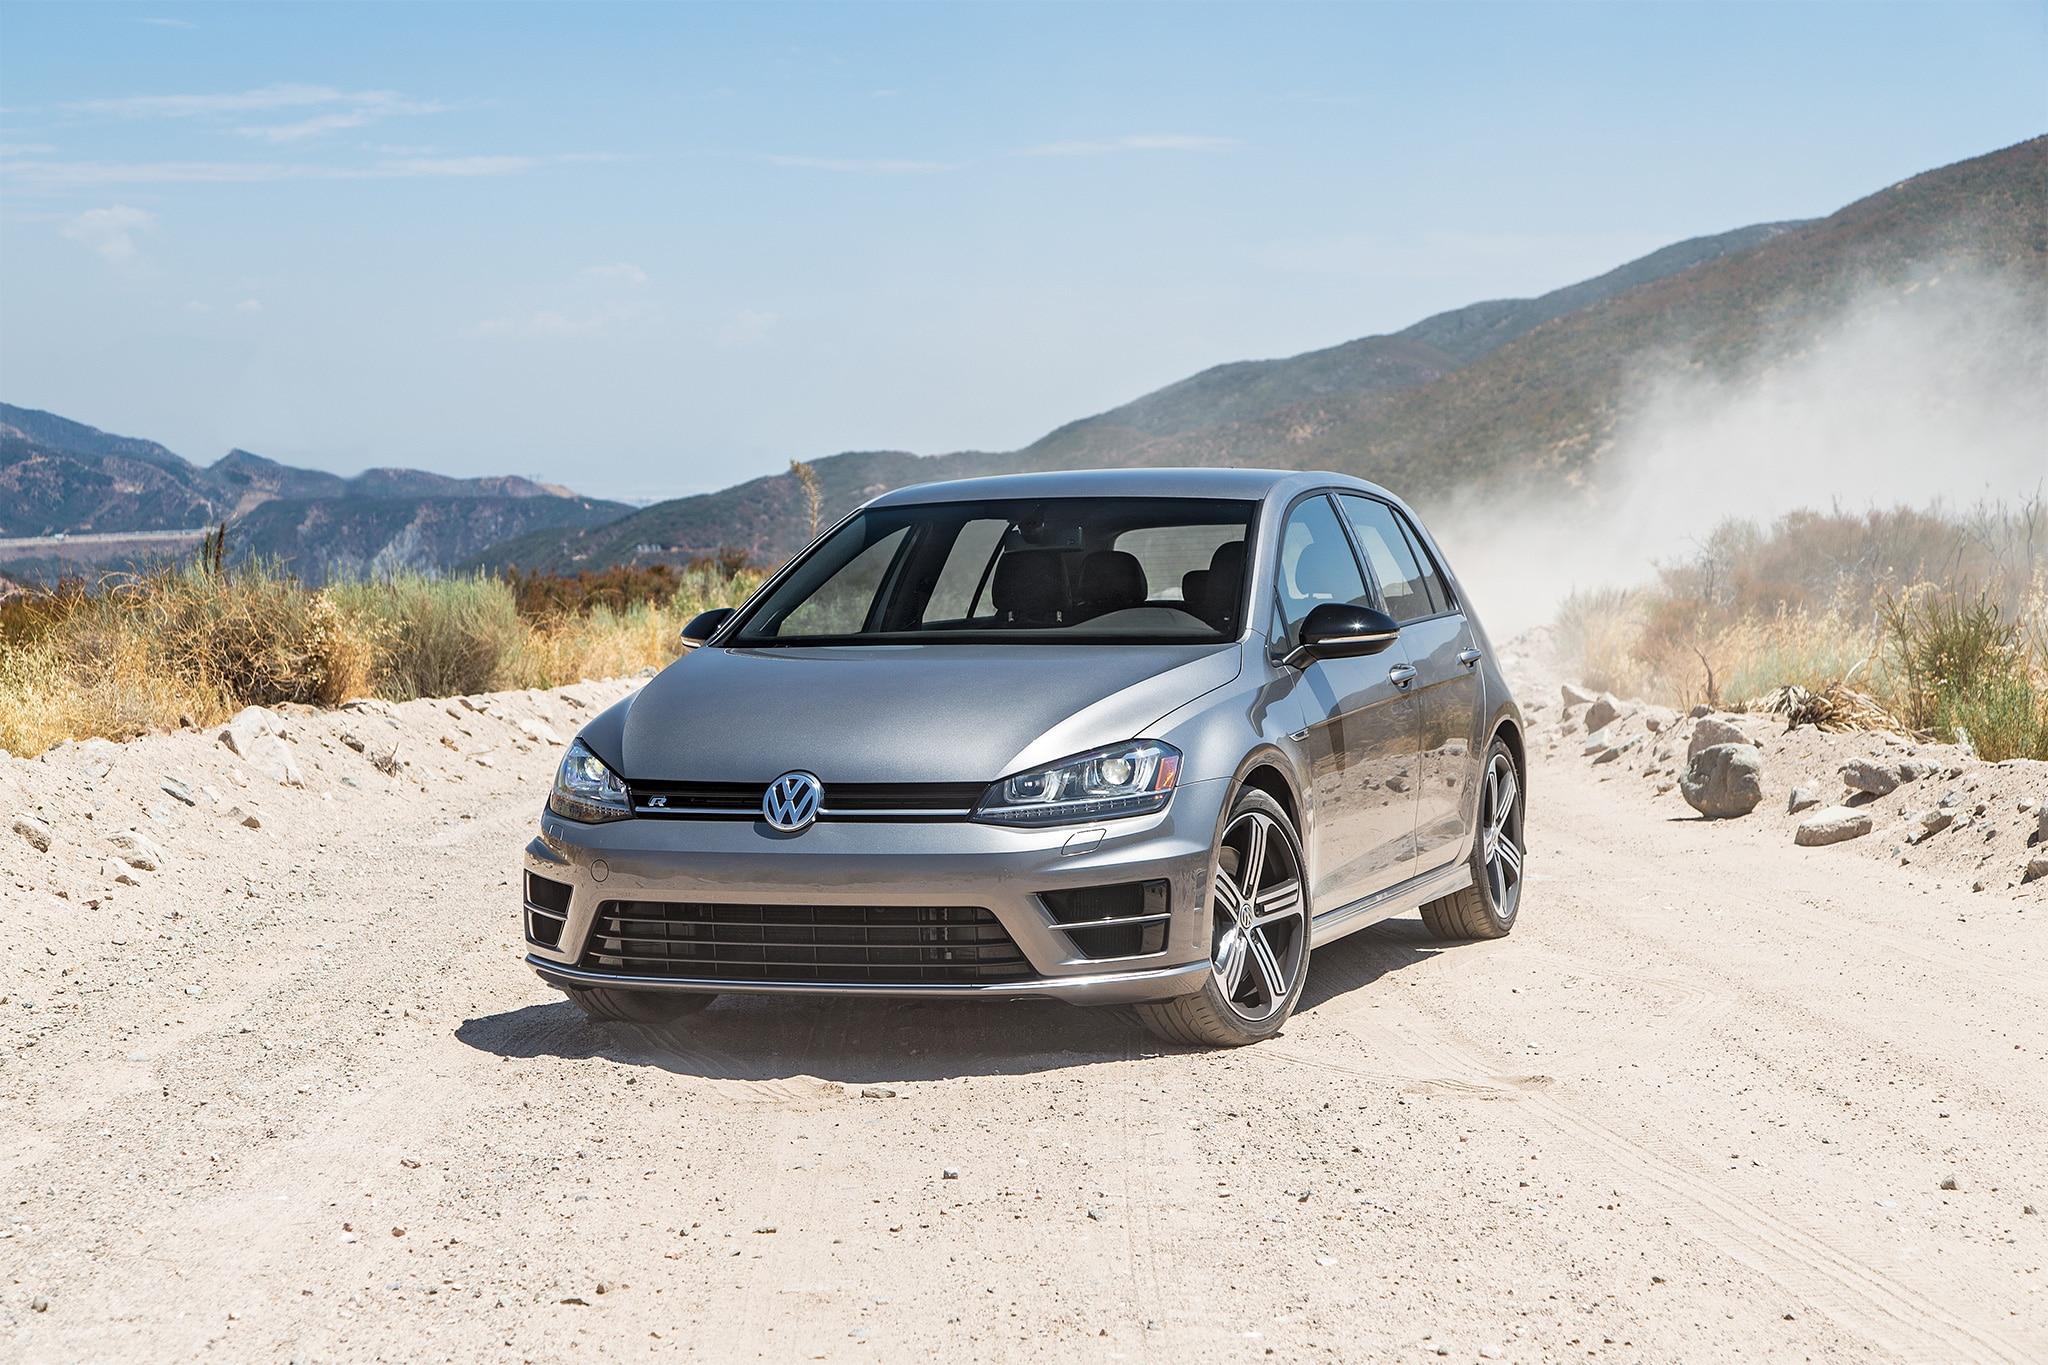 Focus St Shift Knob >> Four Seasons 2016 Volkswagen Golf R Arrival | Automobile Magazine